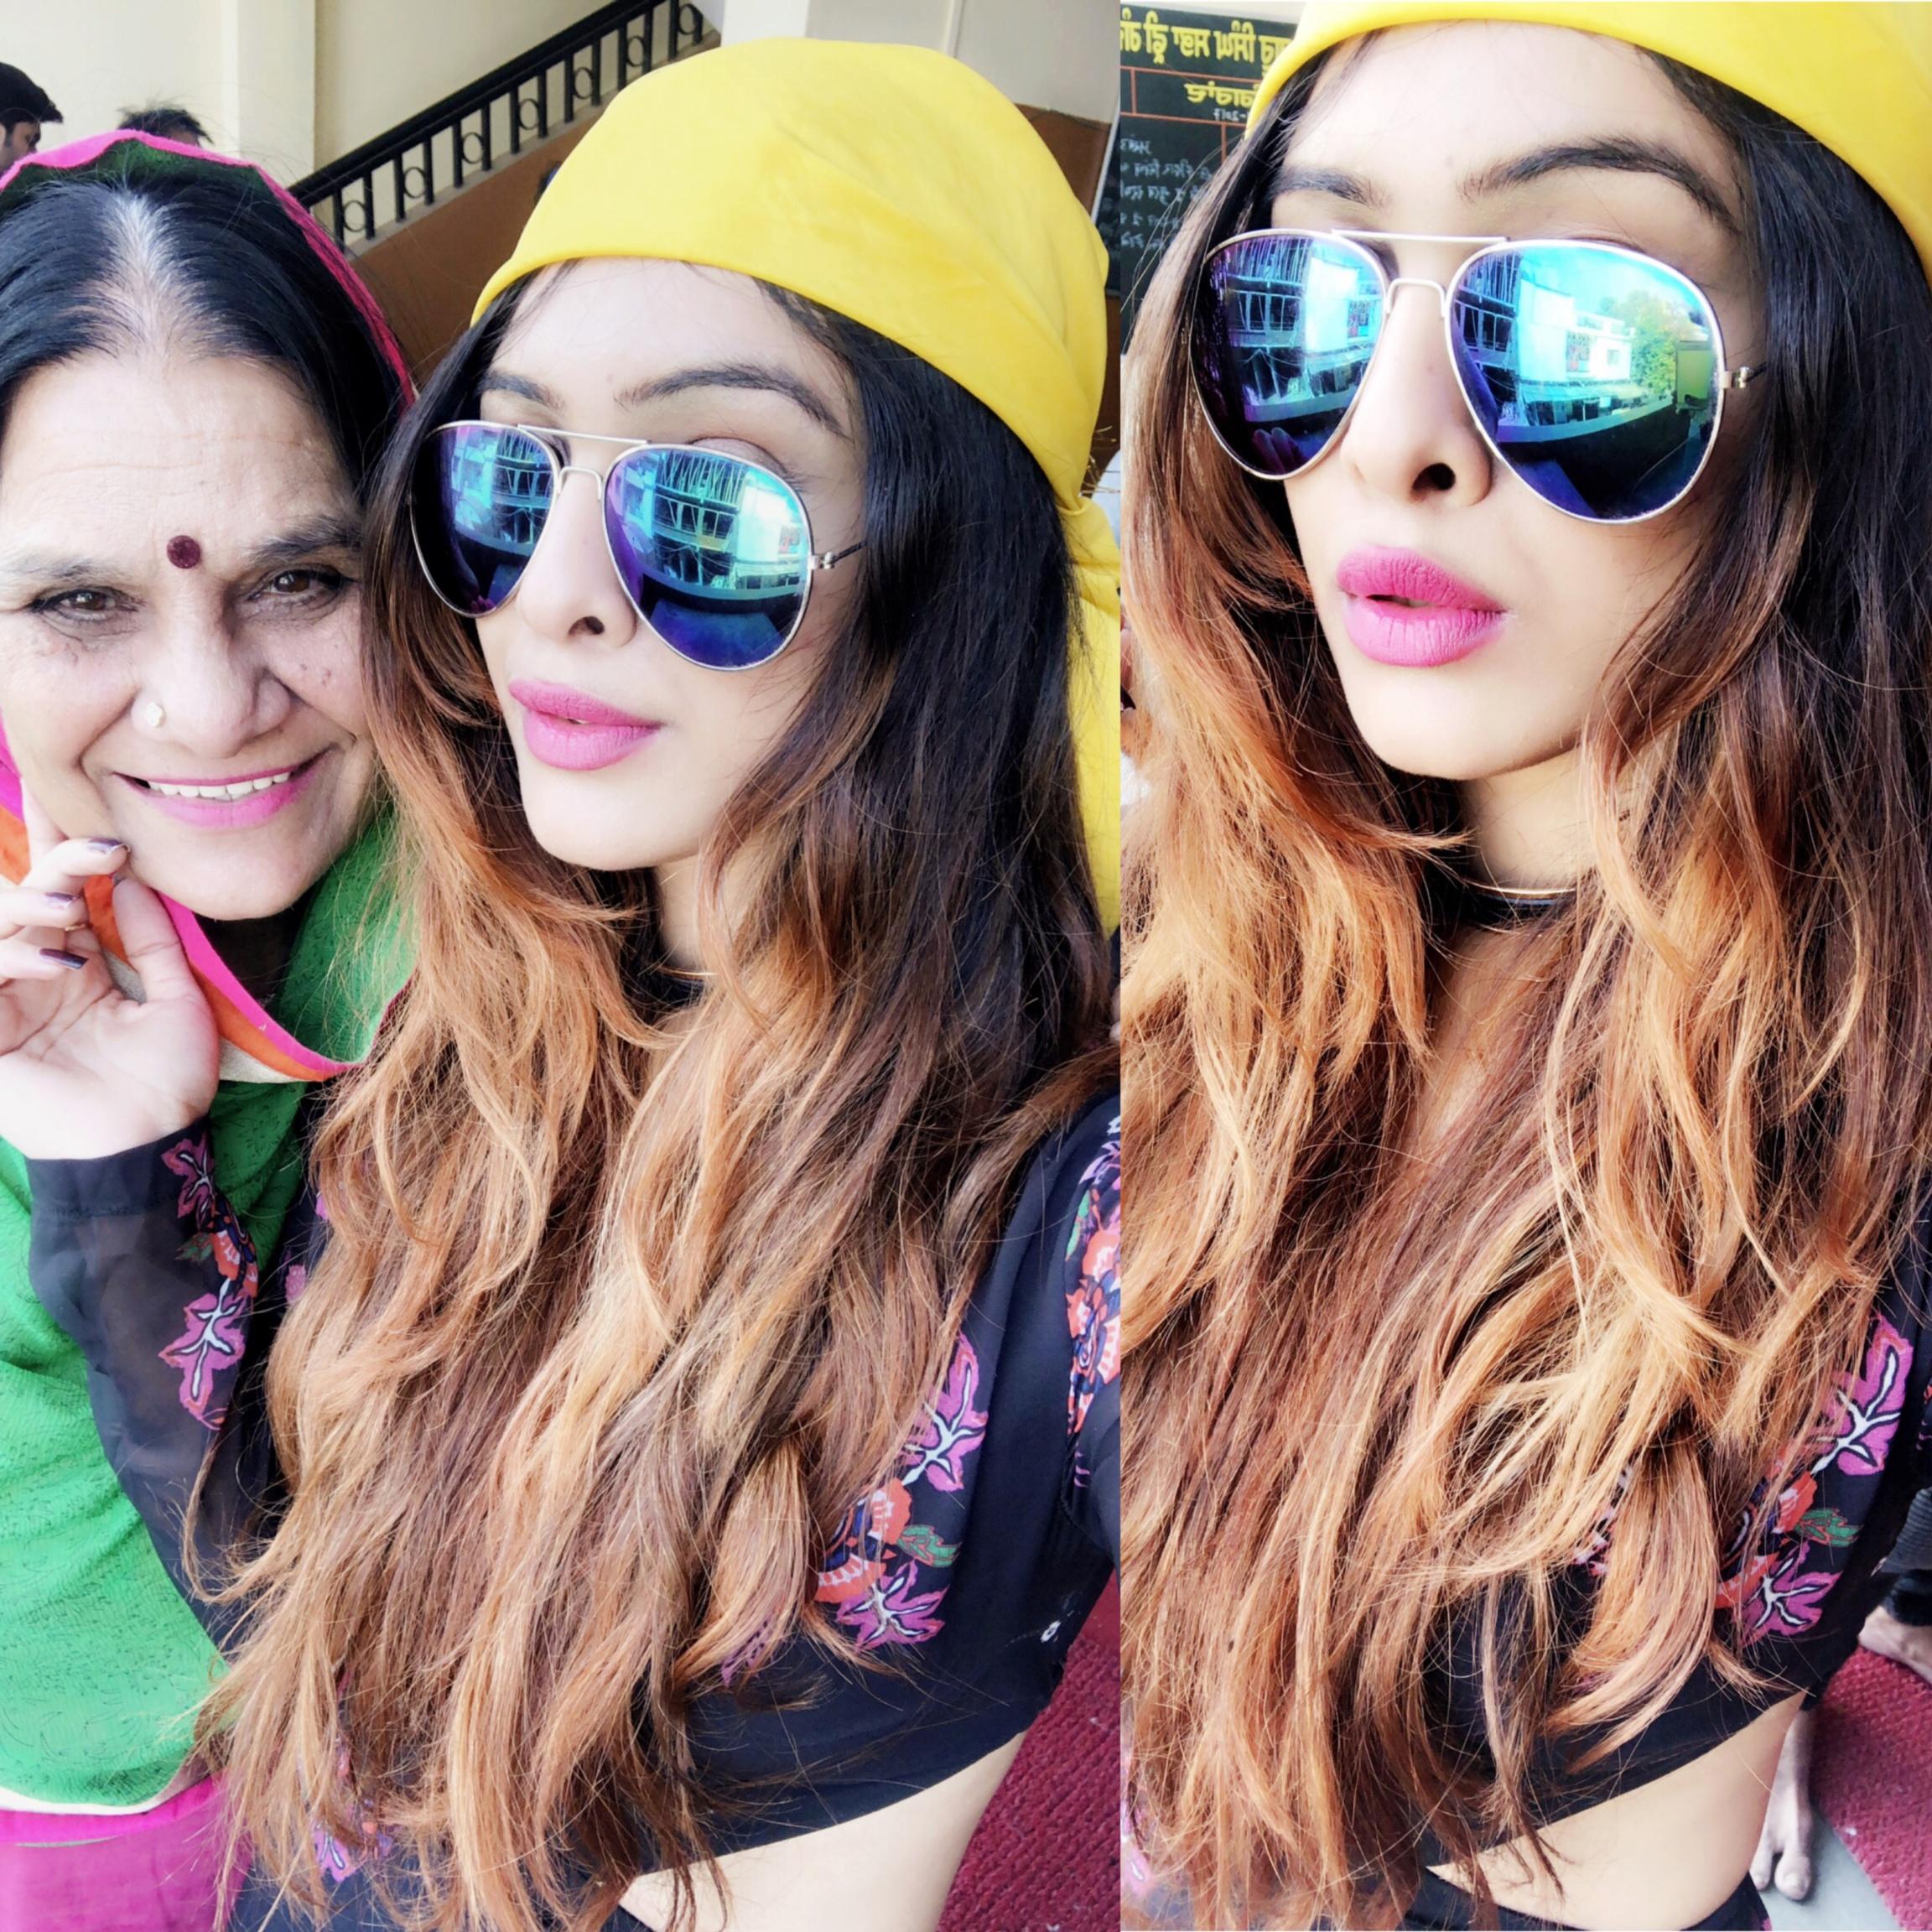 Gurudwara Darshan At Ujjain 😍😍 : #gurudwara #ujjain #madhyapradesh #blessed #beautiful #morningglory #riseandshine #goodmorningworld #spreadlove #spreadhappiness #satnamwaheguru #waheguru #blessyou #proudpunjabi #punjabigirl #punjaban #happytime #mommyandme #nehamalik #model #actor #blogger